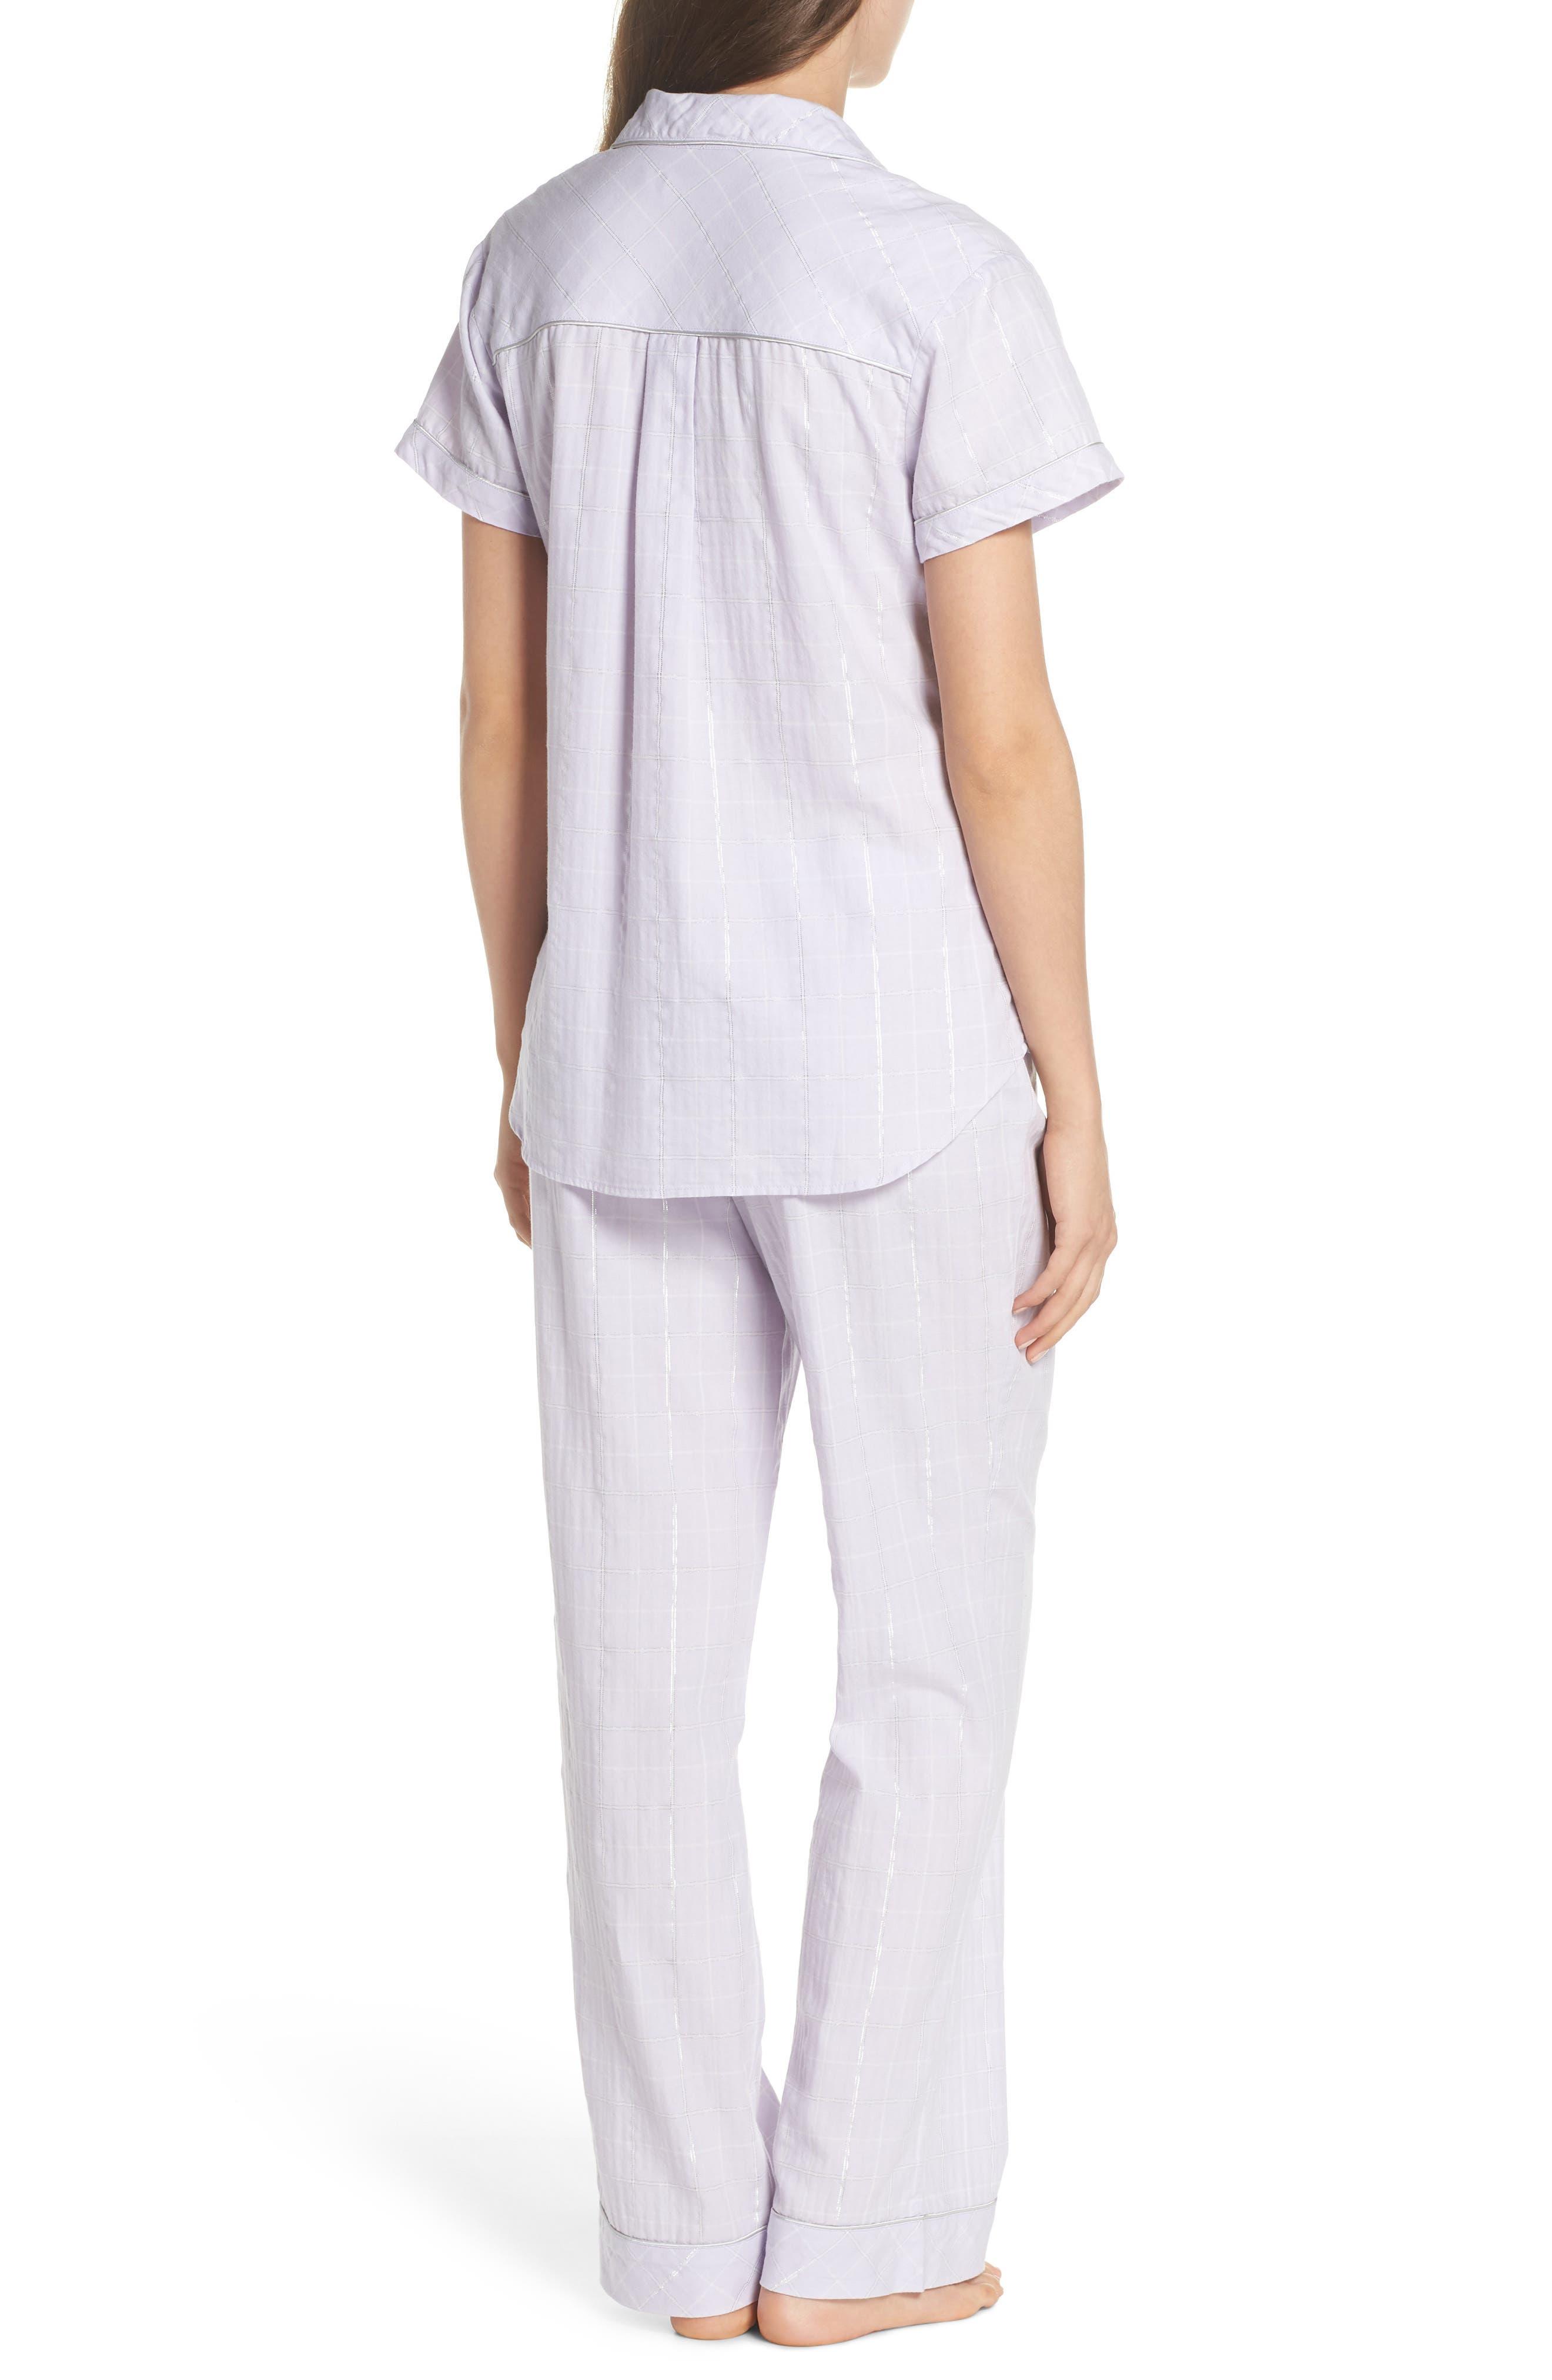 Rosan Sparkle Pajamas,                             Alternate thumbnail 2, color,                             538